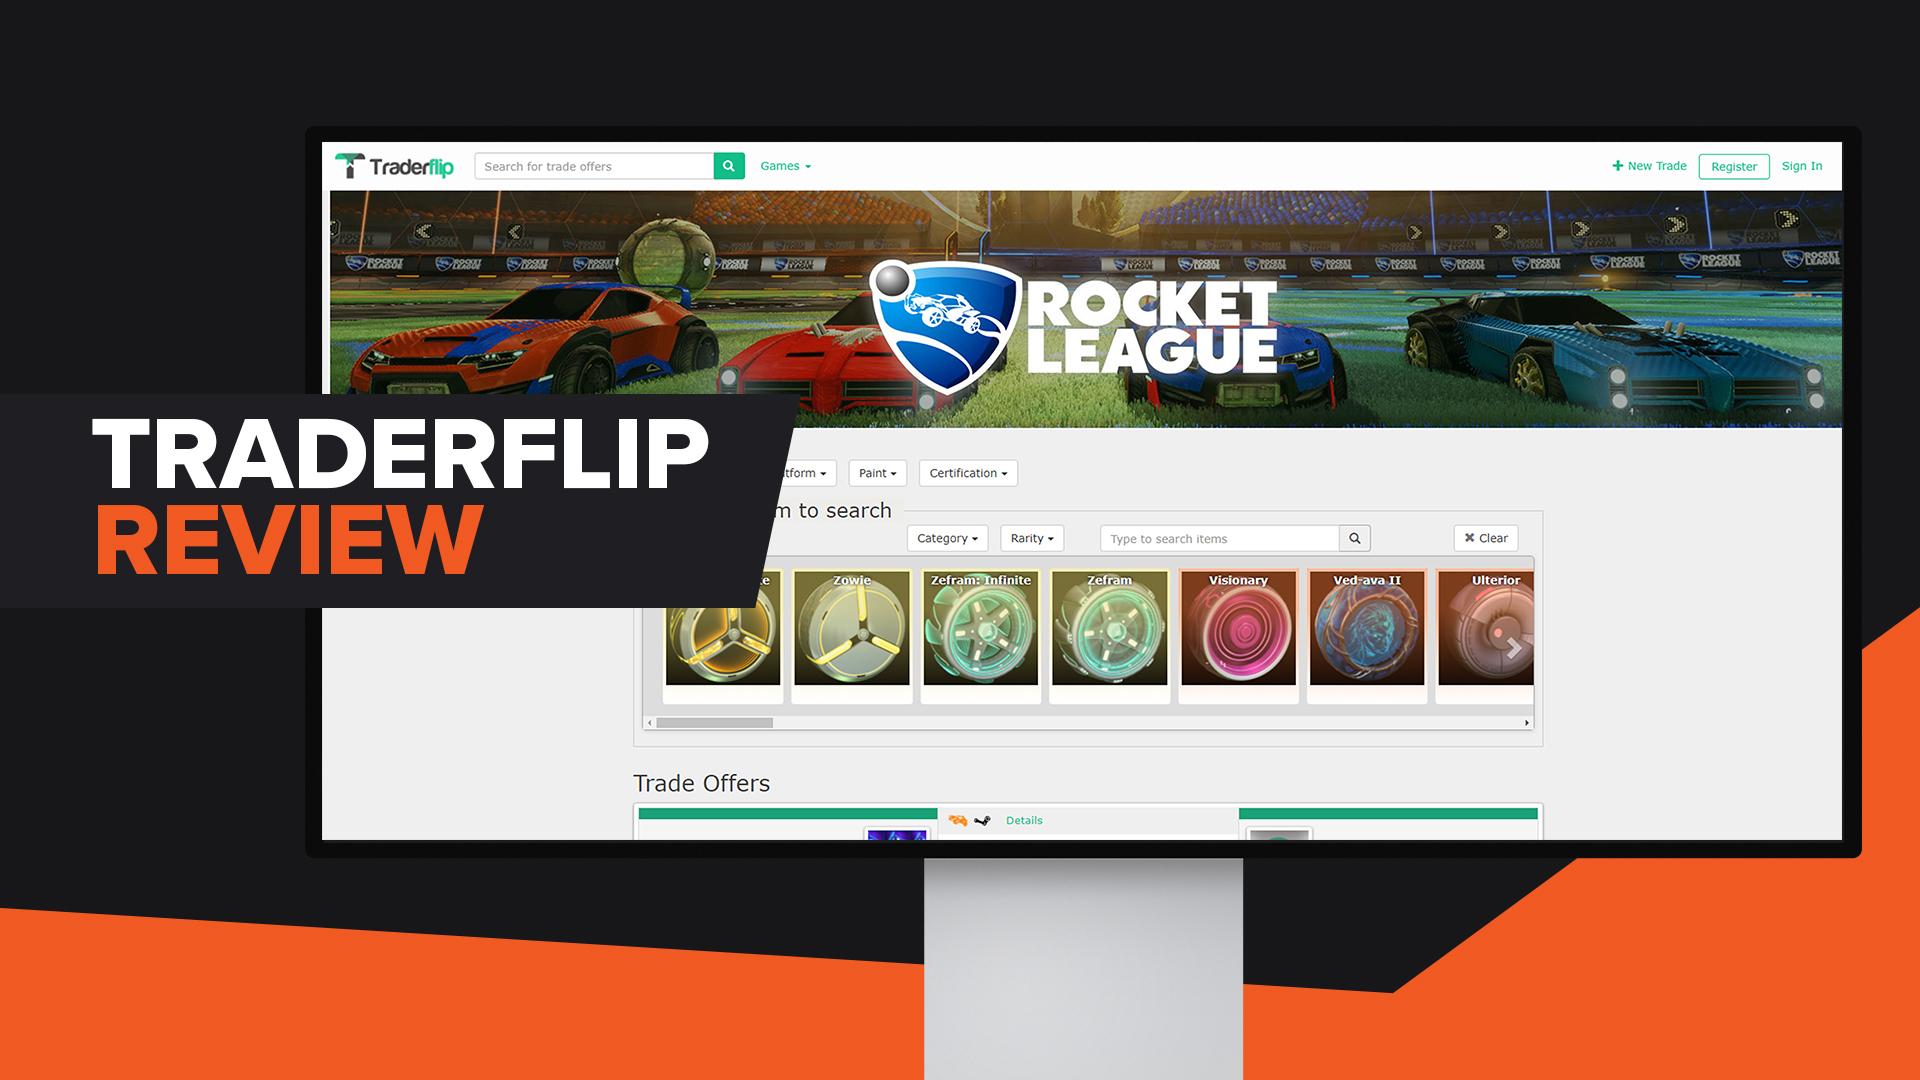 Traderflip Review Rocket League